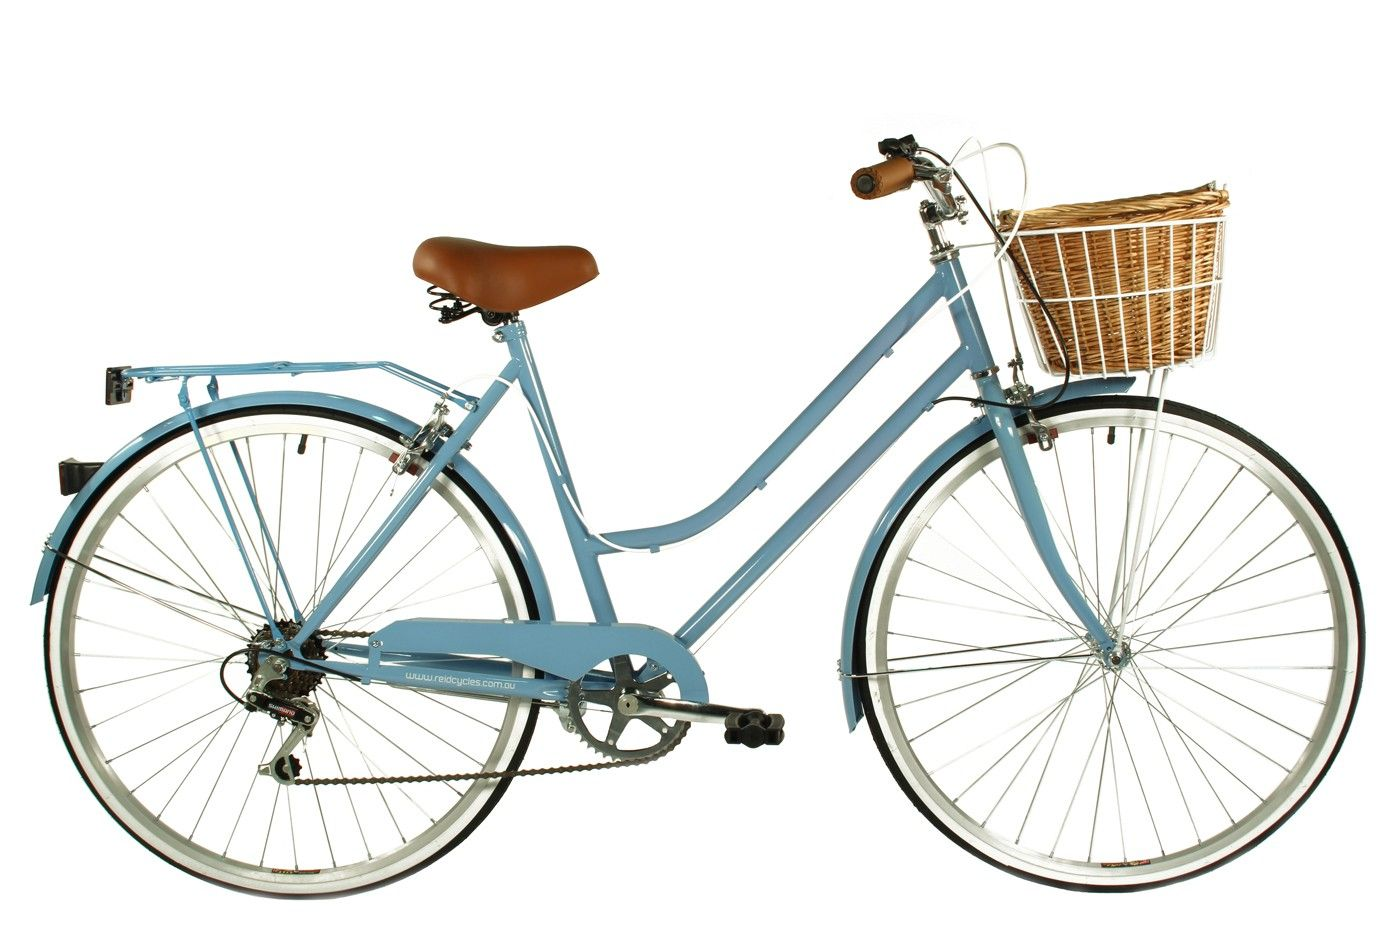 2012 Reid Vintage Ladies Bike 6 Speed Special Edition Fahrrad